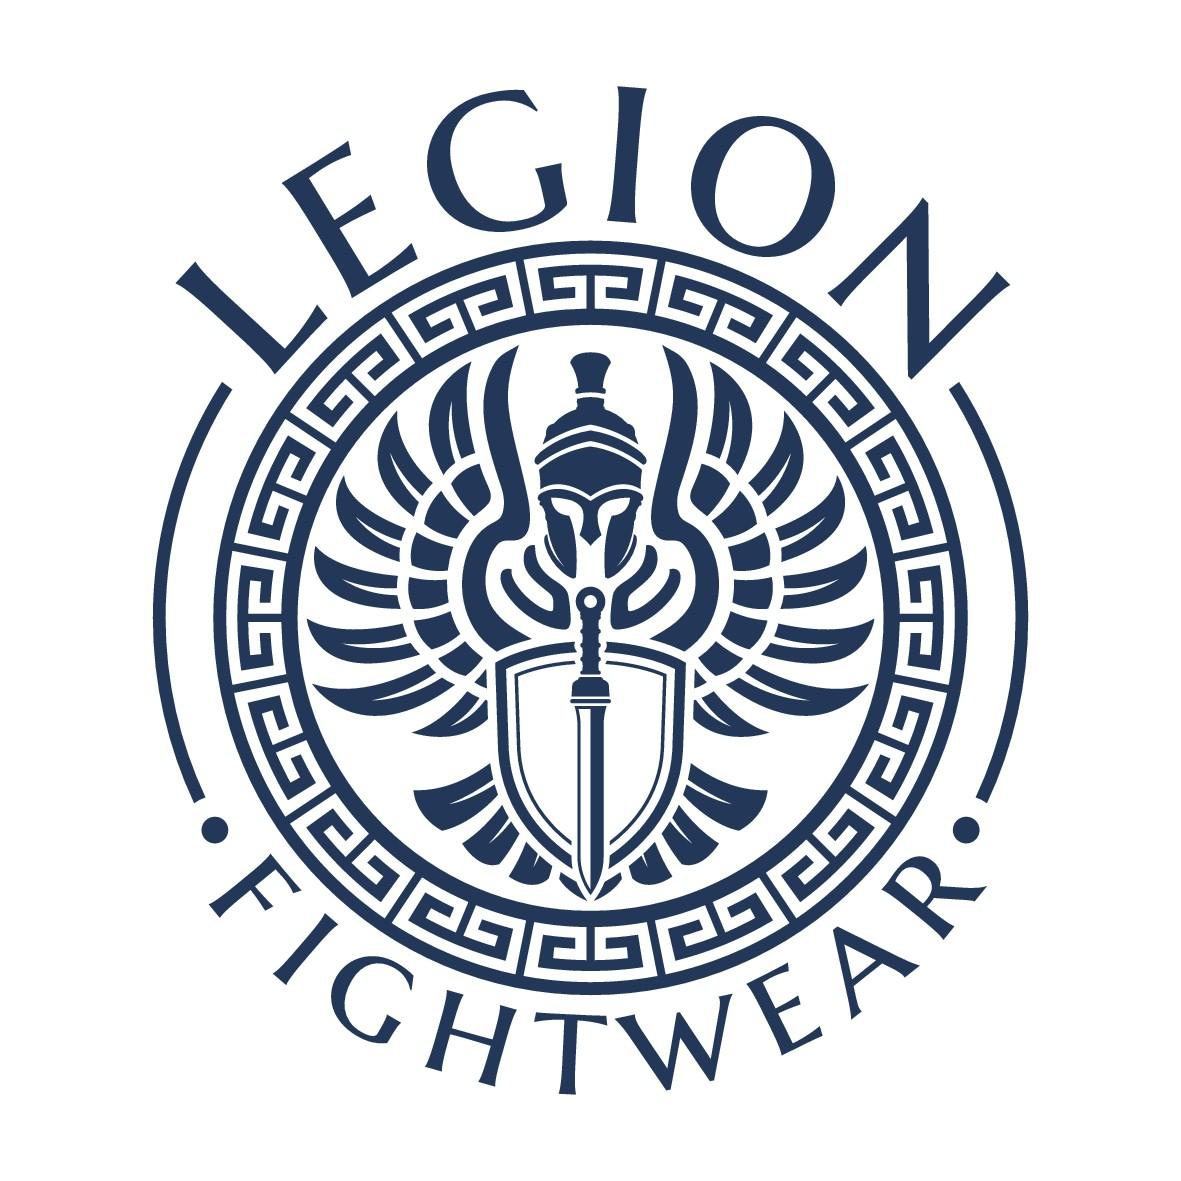 Create a sleek, masculine logo for a combat sports apparel company